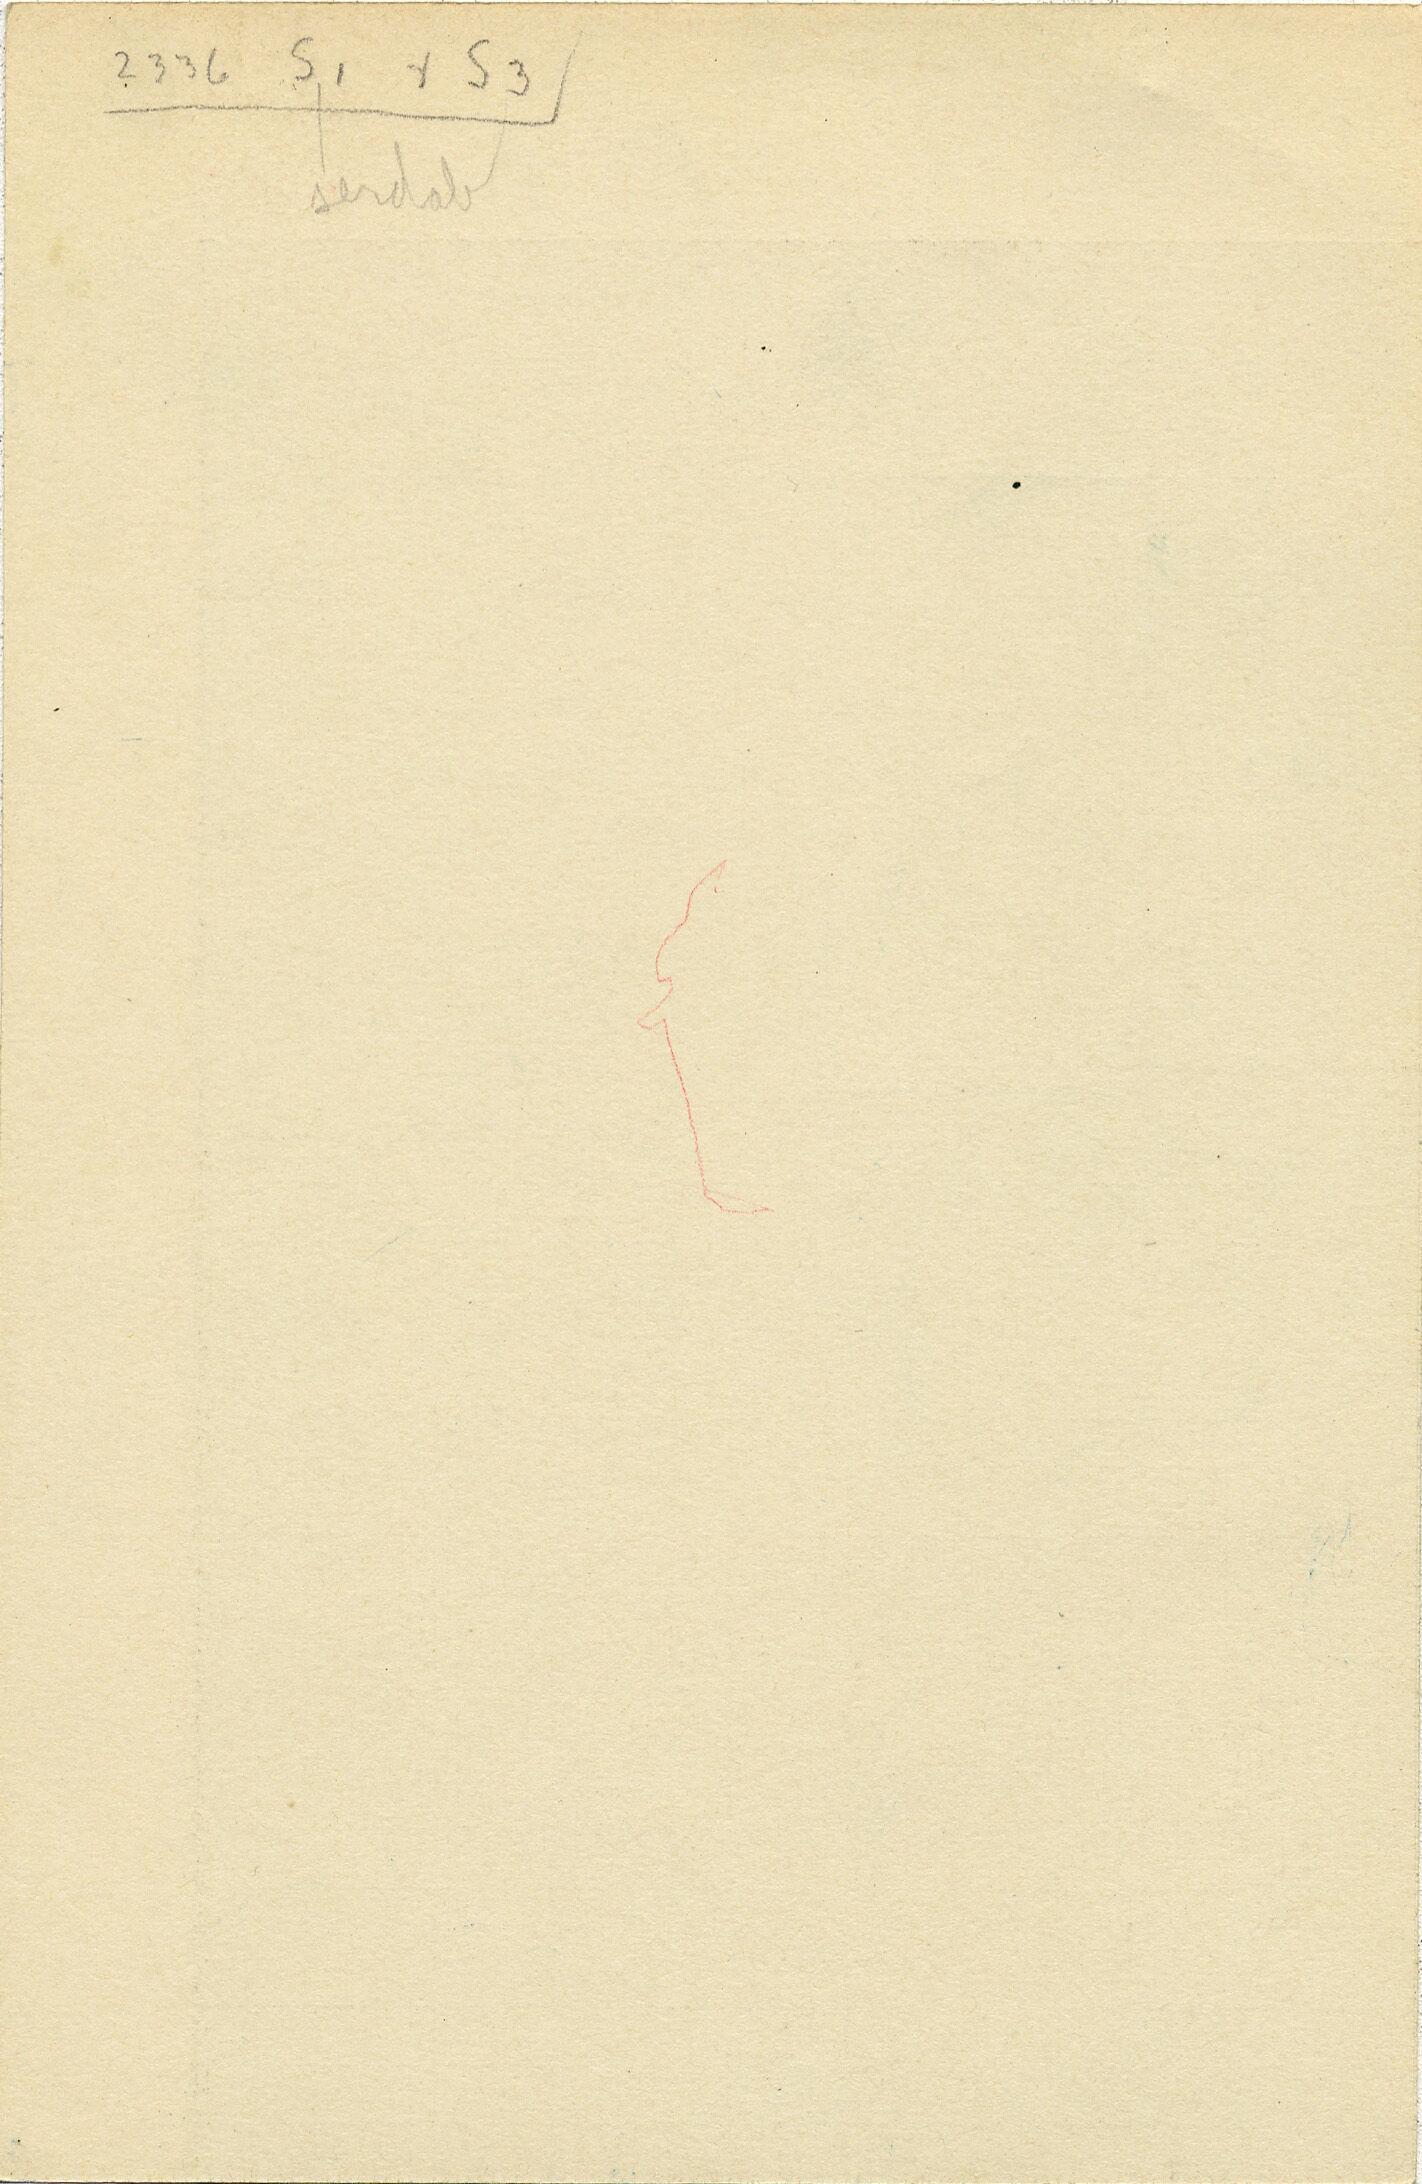 Notes: G 2336, Shaft E, notes